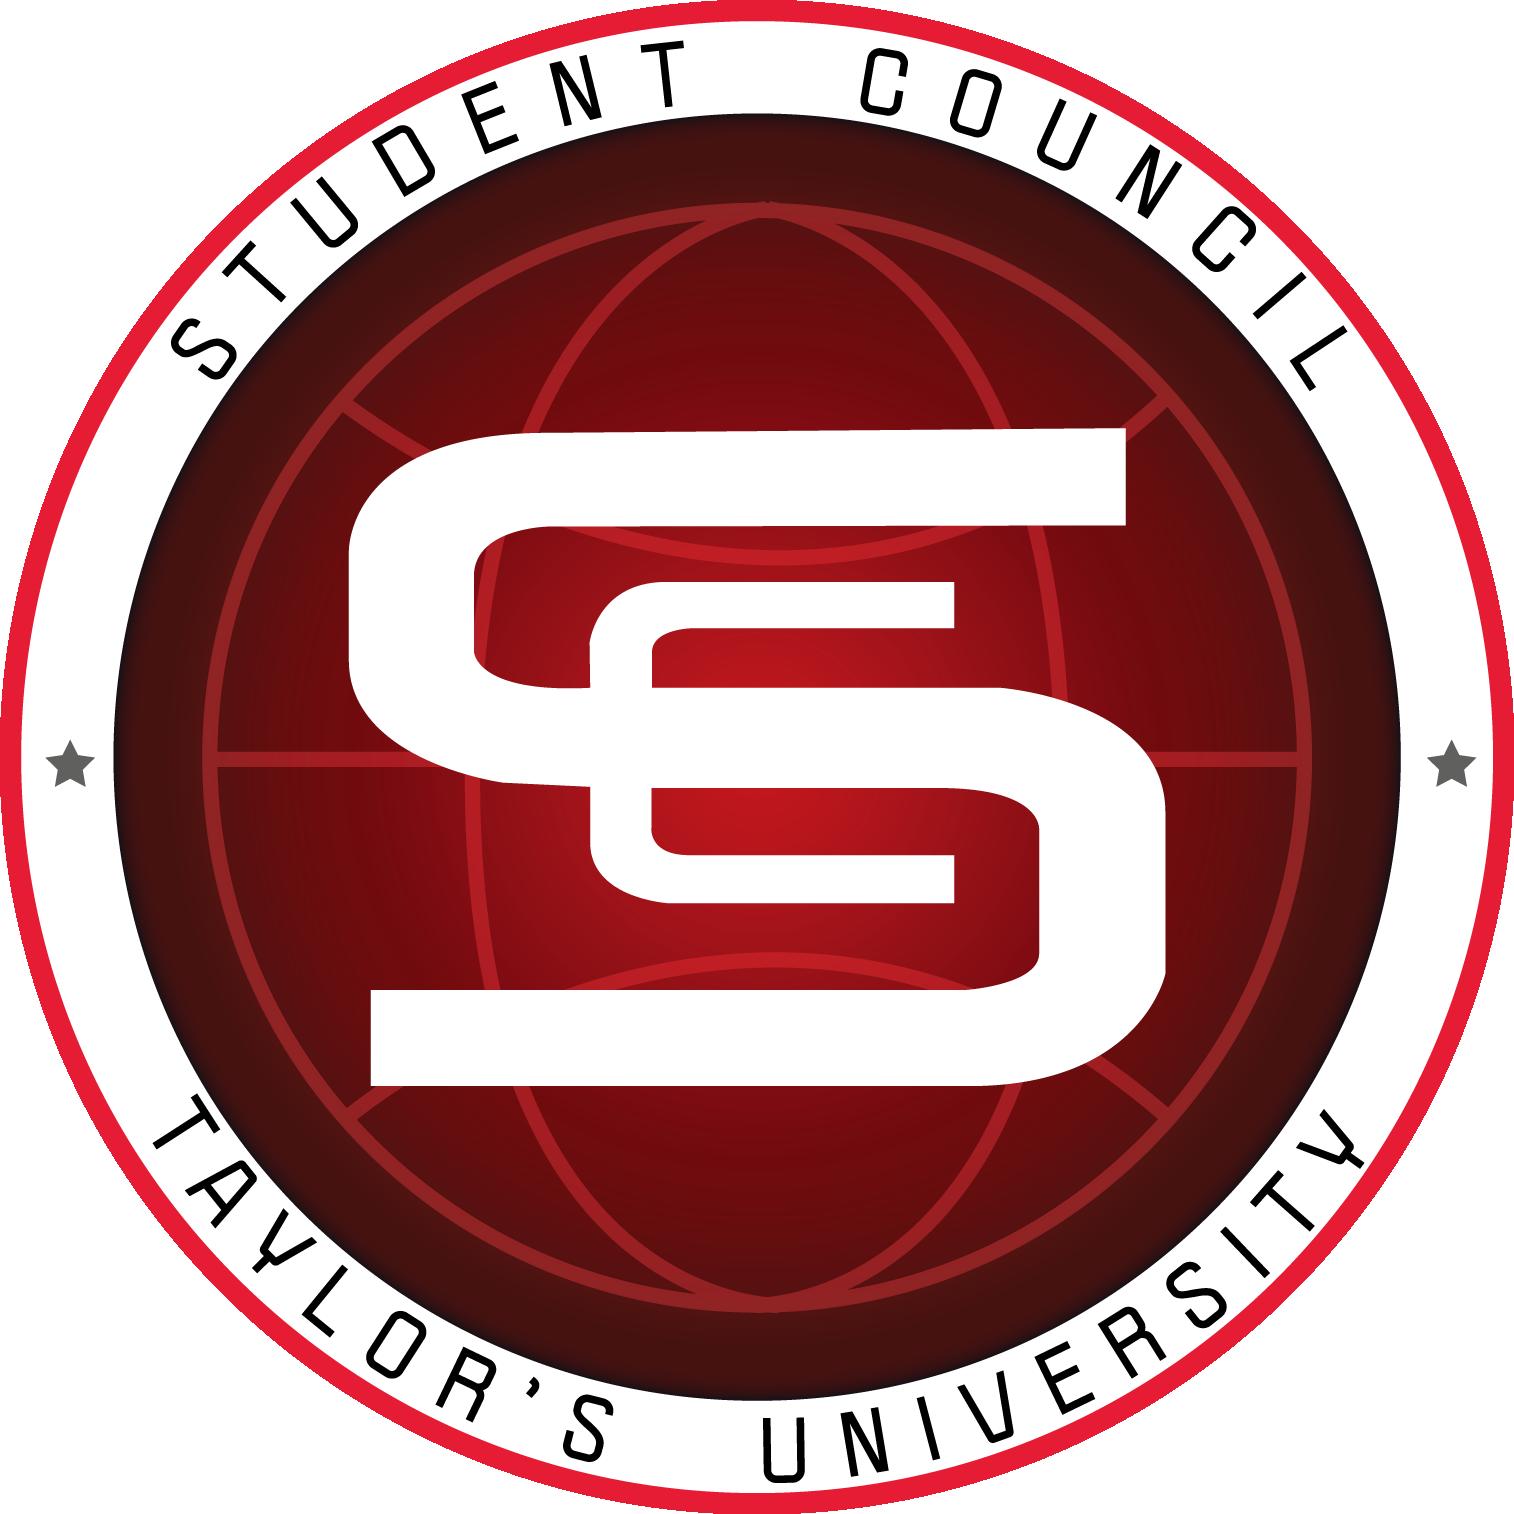 Taylor's University Student Council